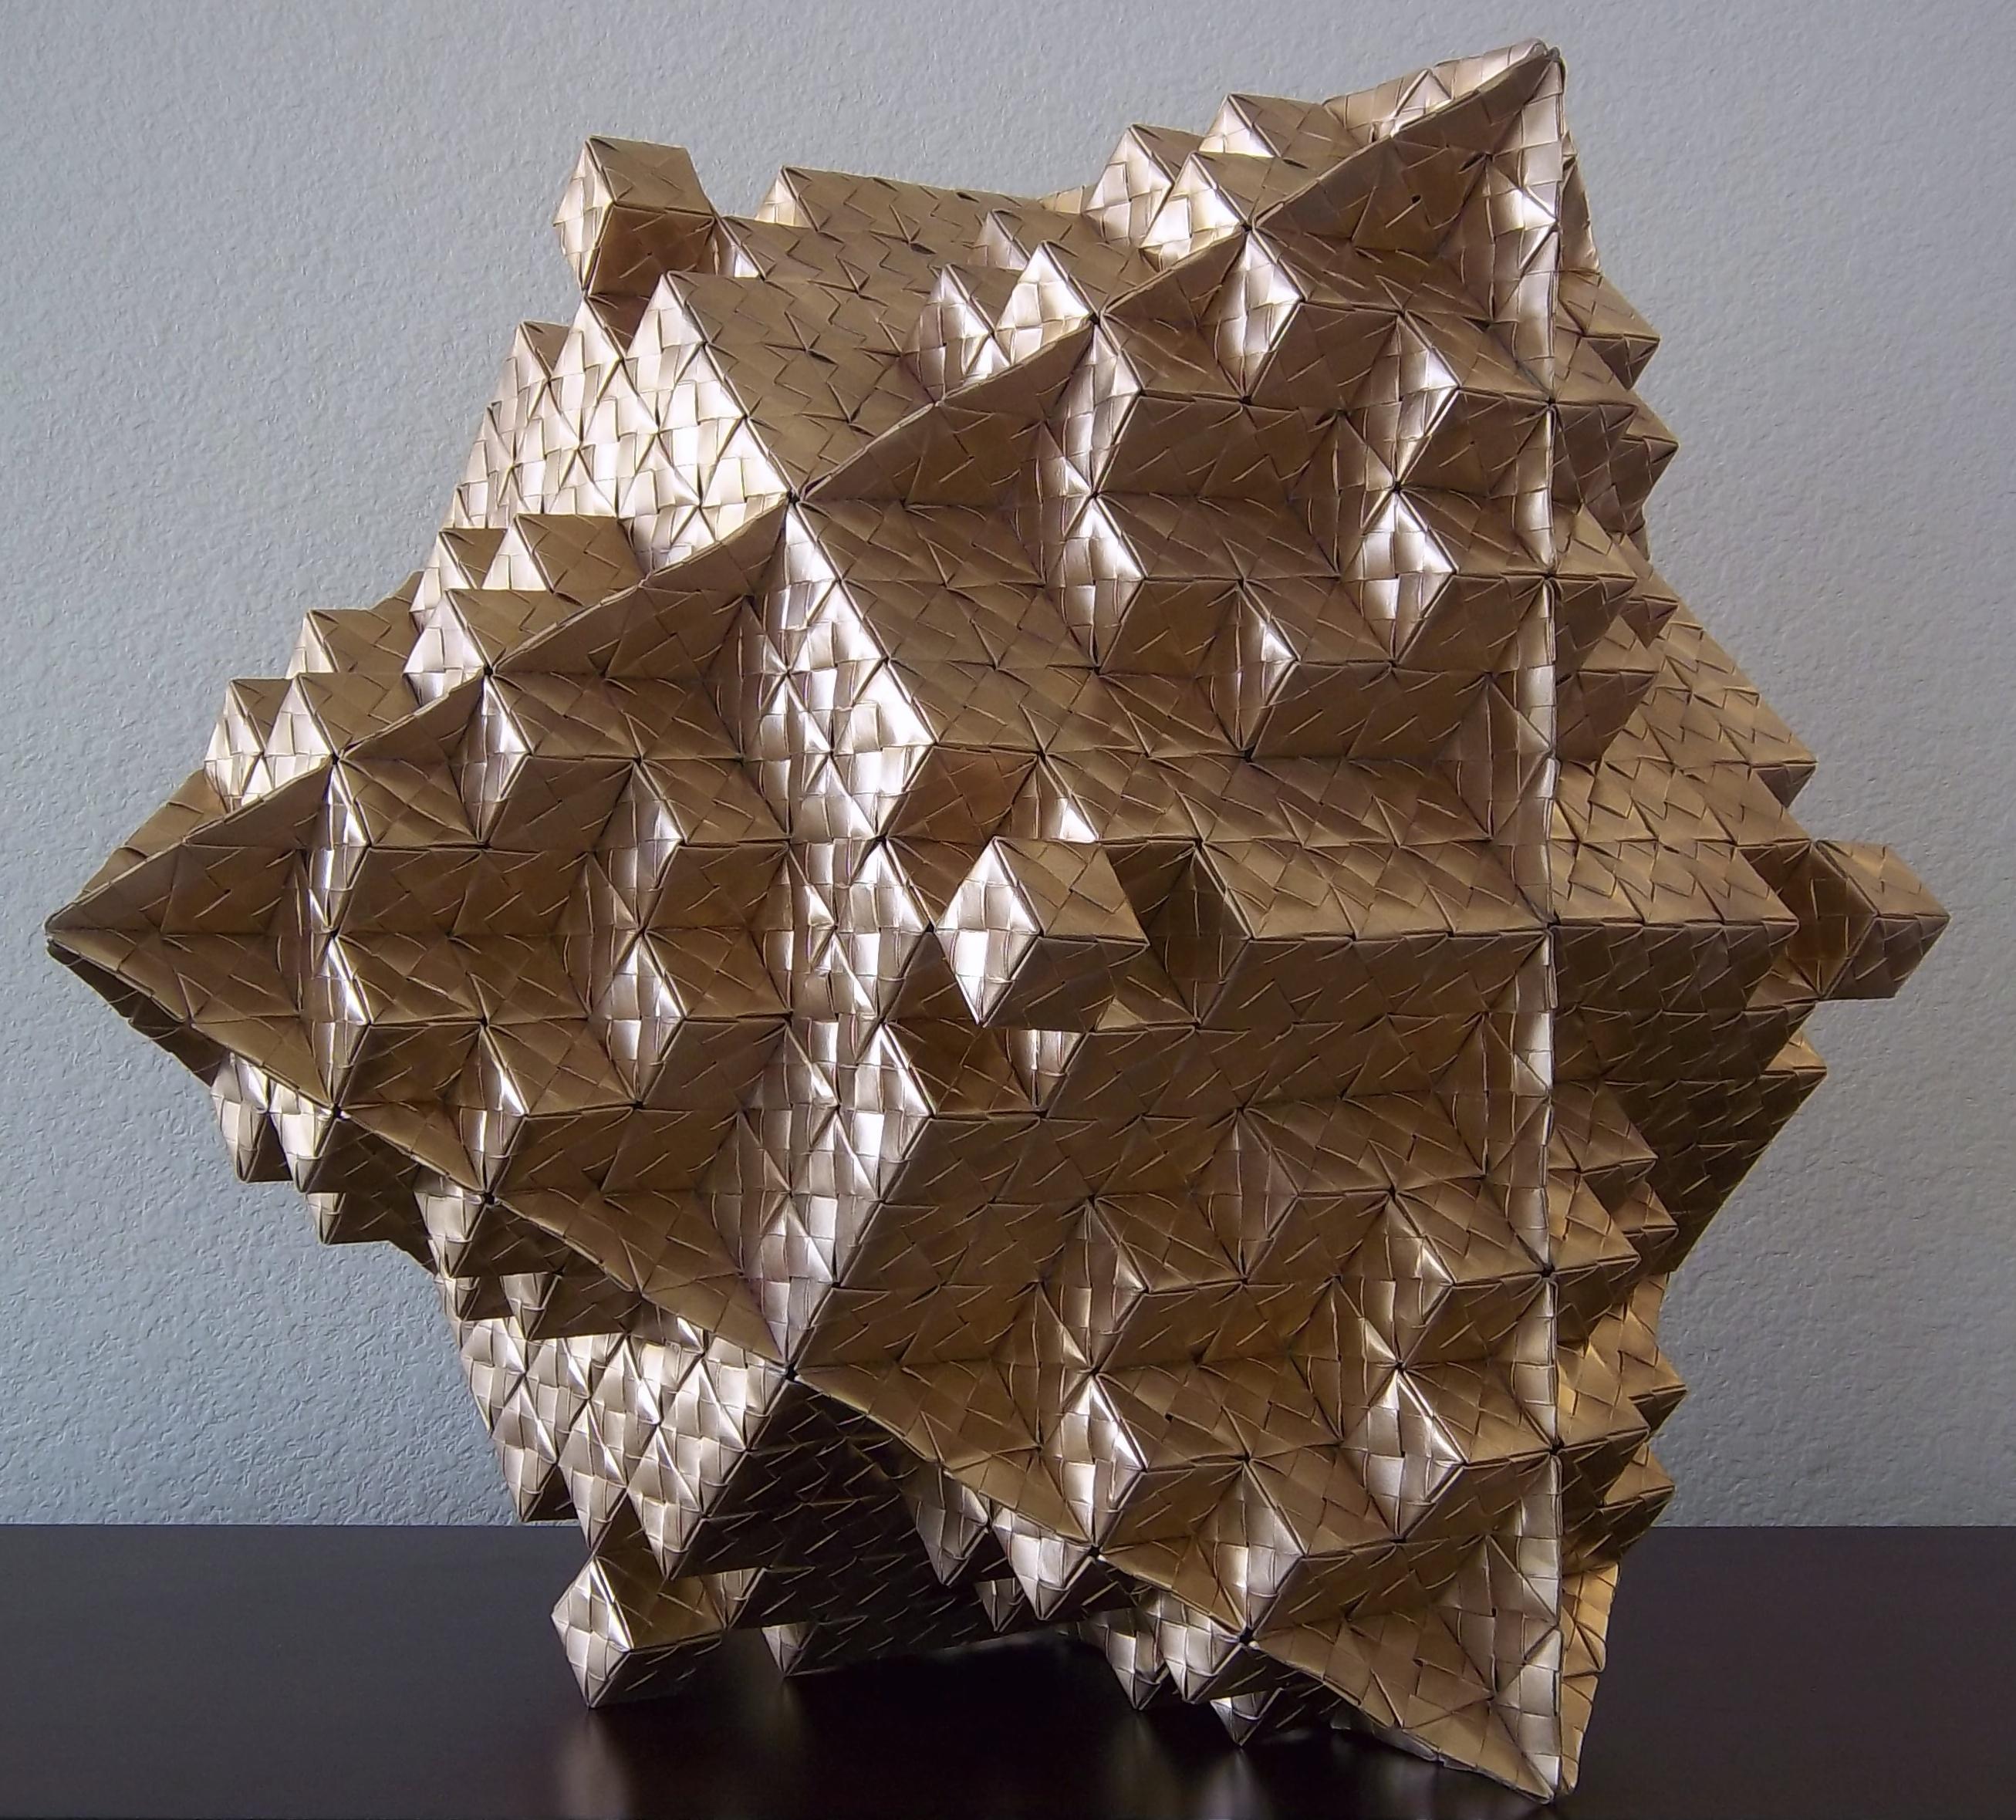 Octahedron Variation in Origami